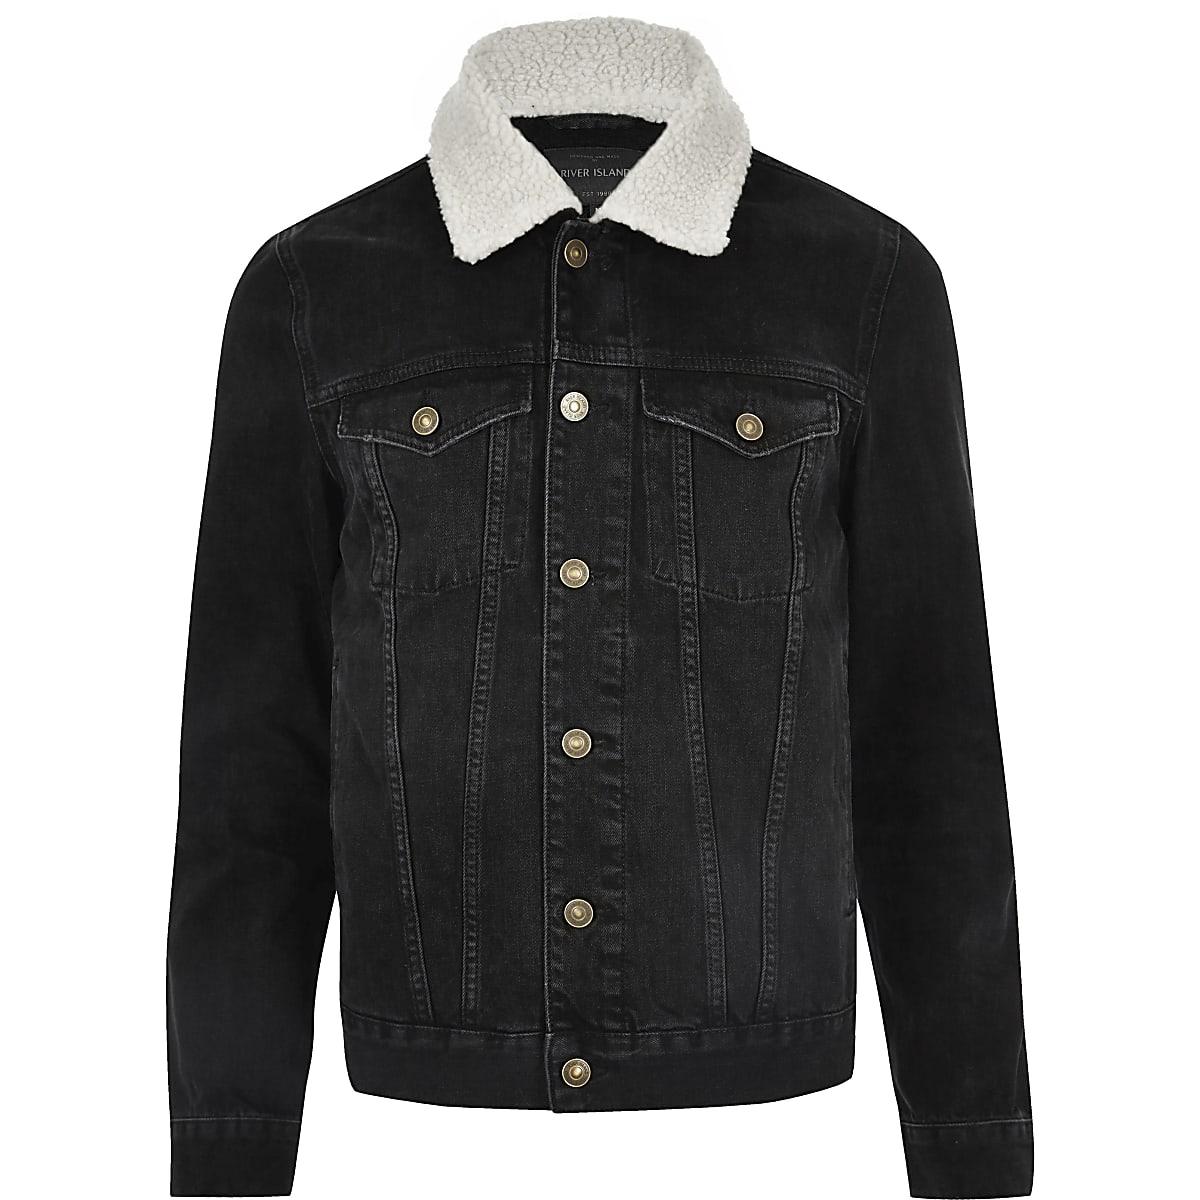 ca991b9215f1 Black washed borg collar denim jacket - Jackets - Coats   Jackets - men